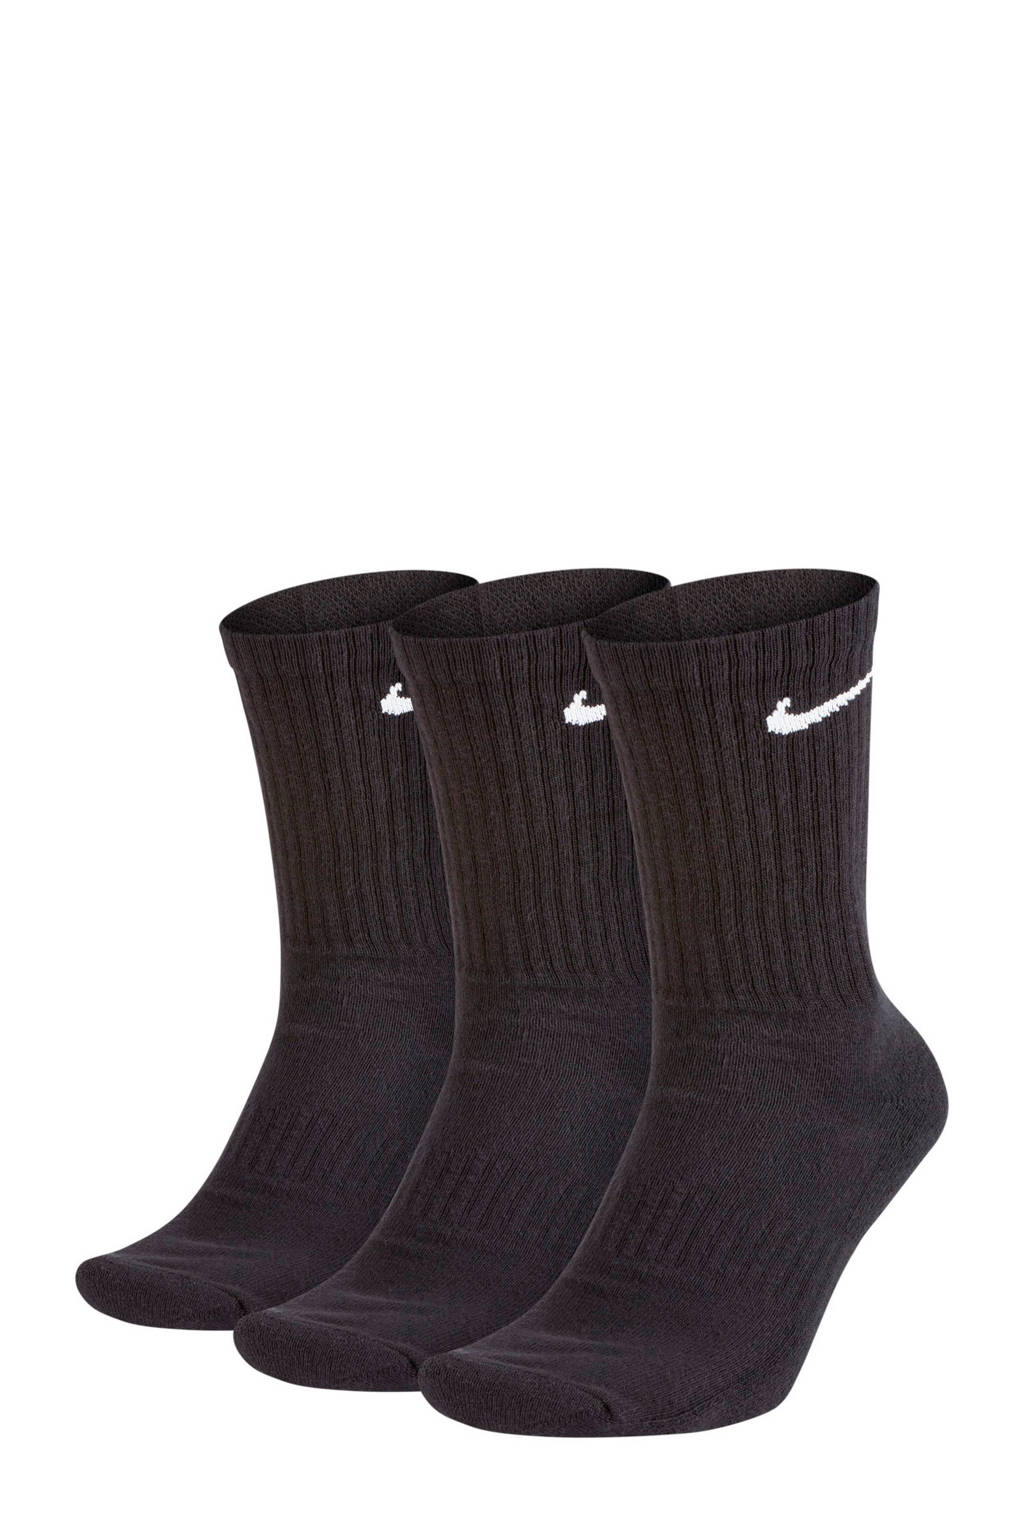 Nike   sportsokken (set van 3) zwart, Zwart